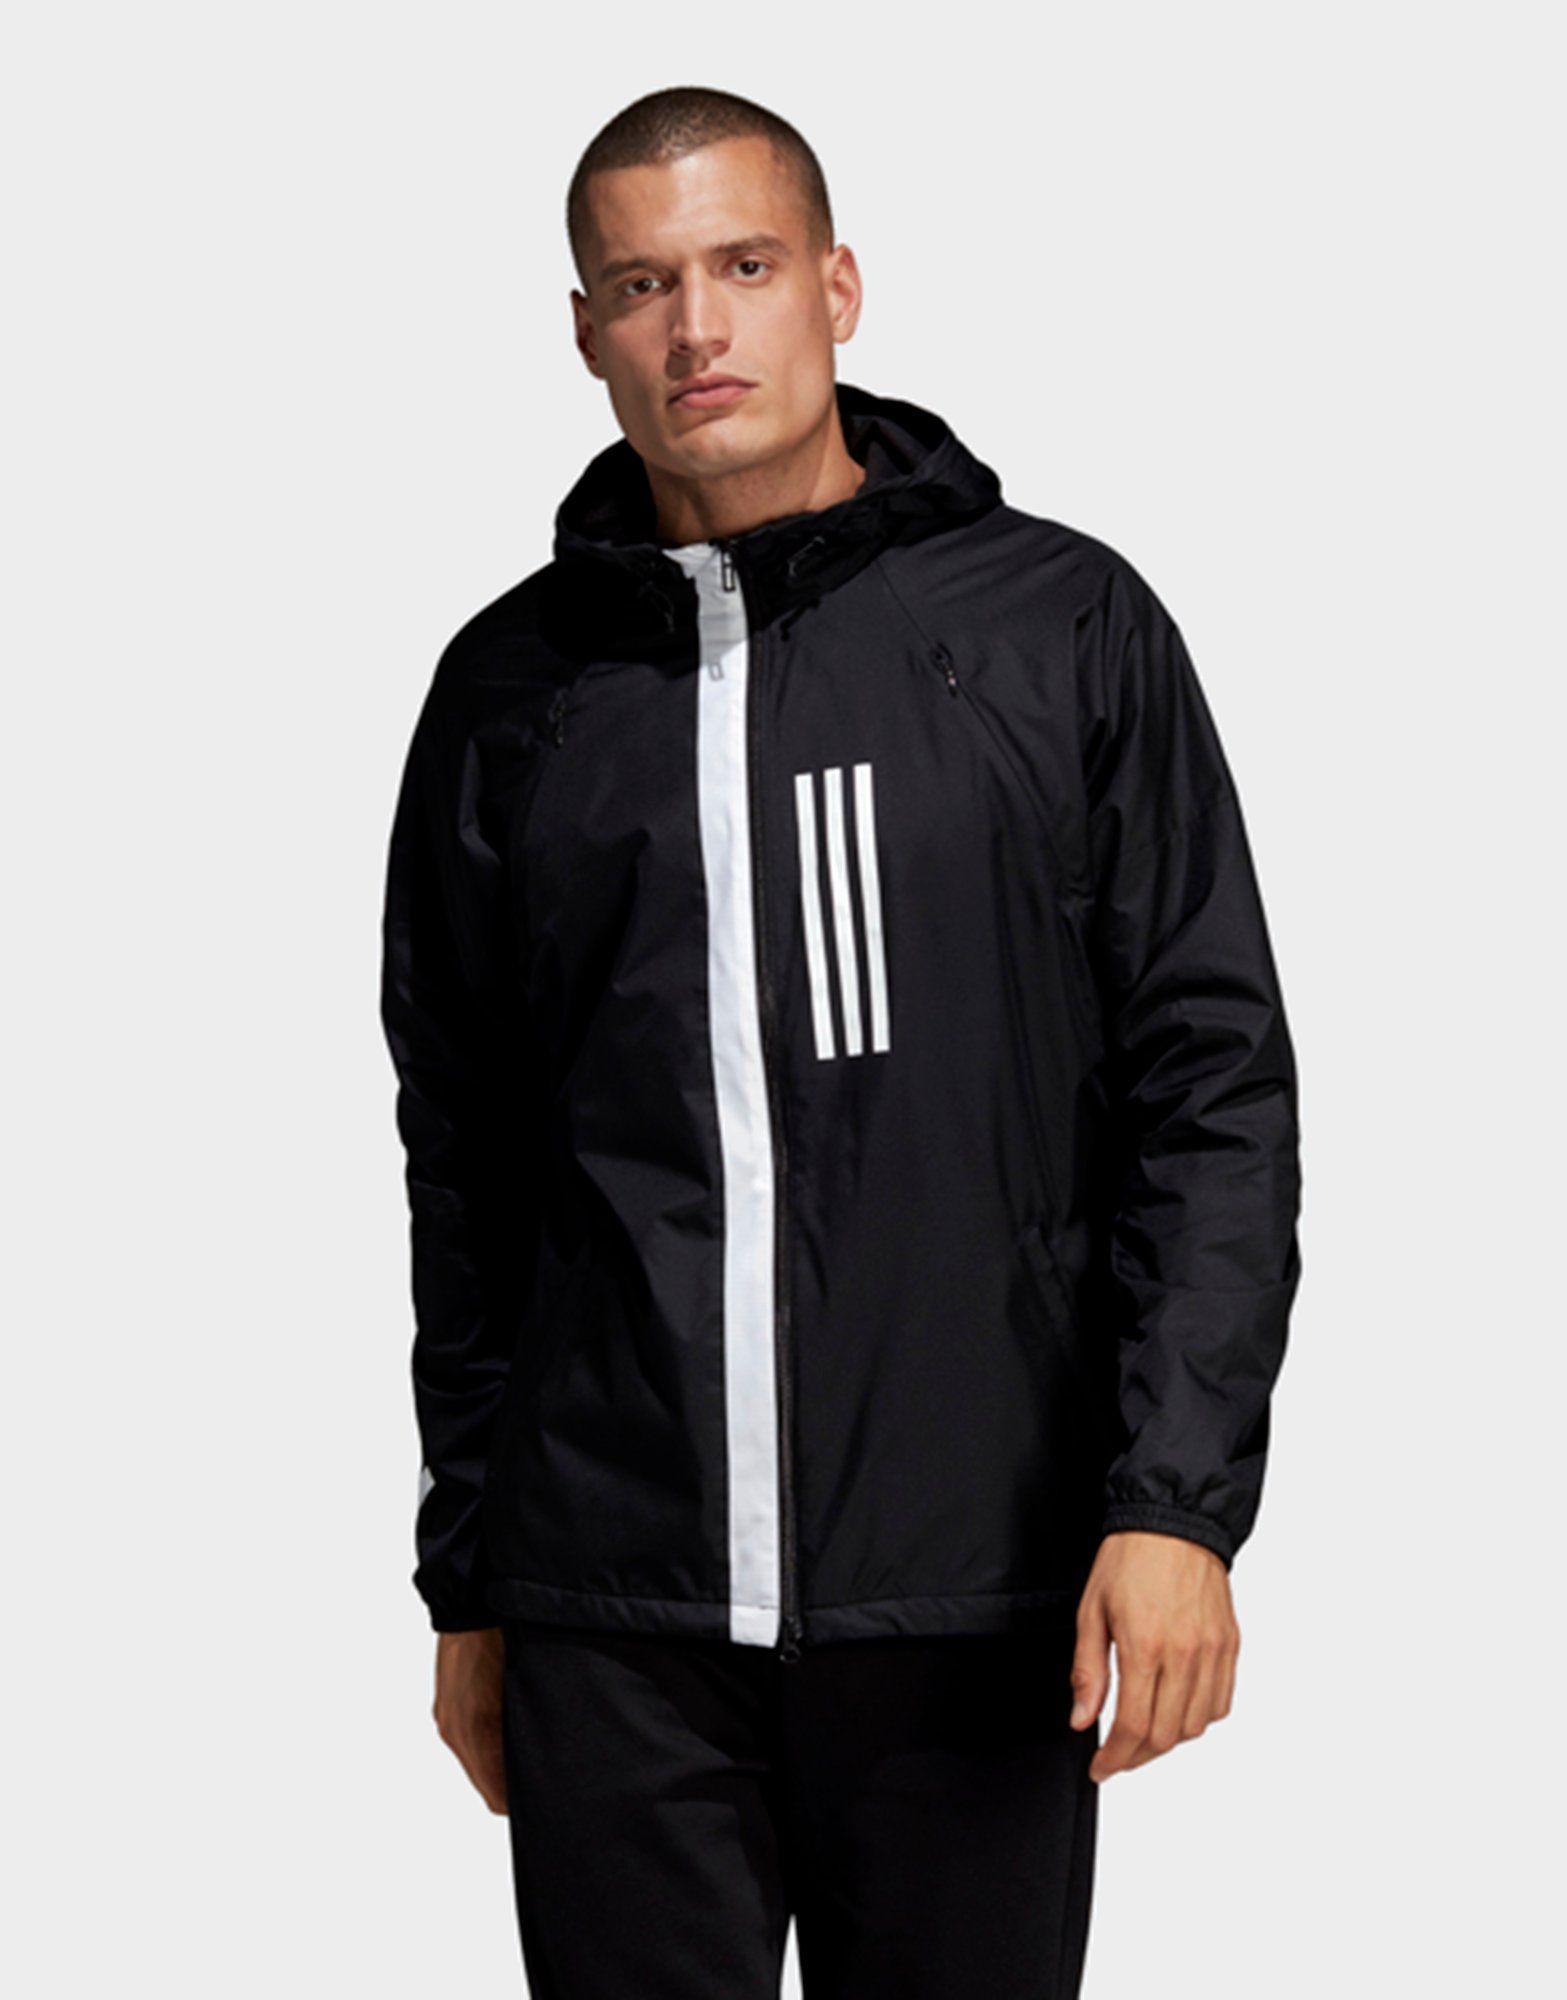 ADIDAS W.N.D. Fleece-Lined Jacket